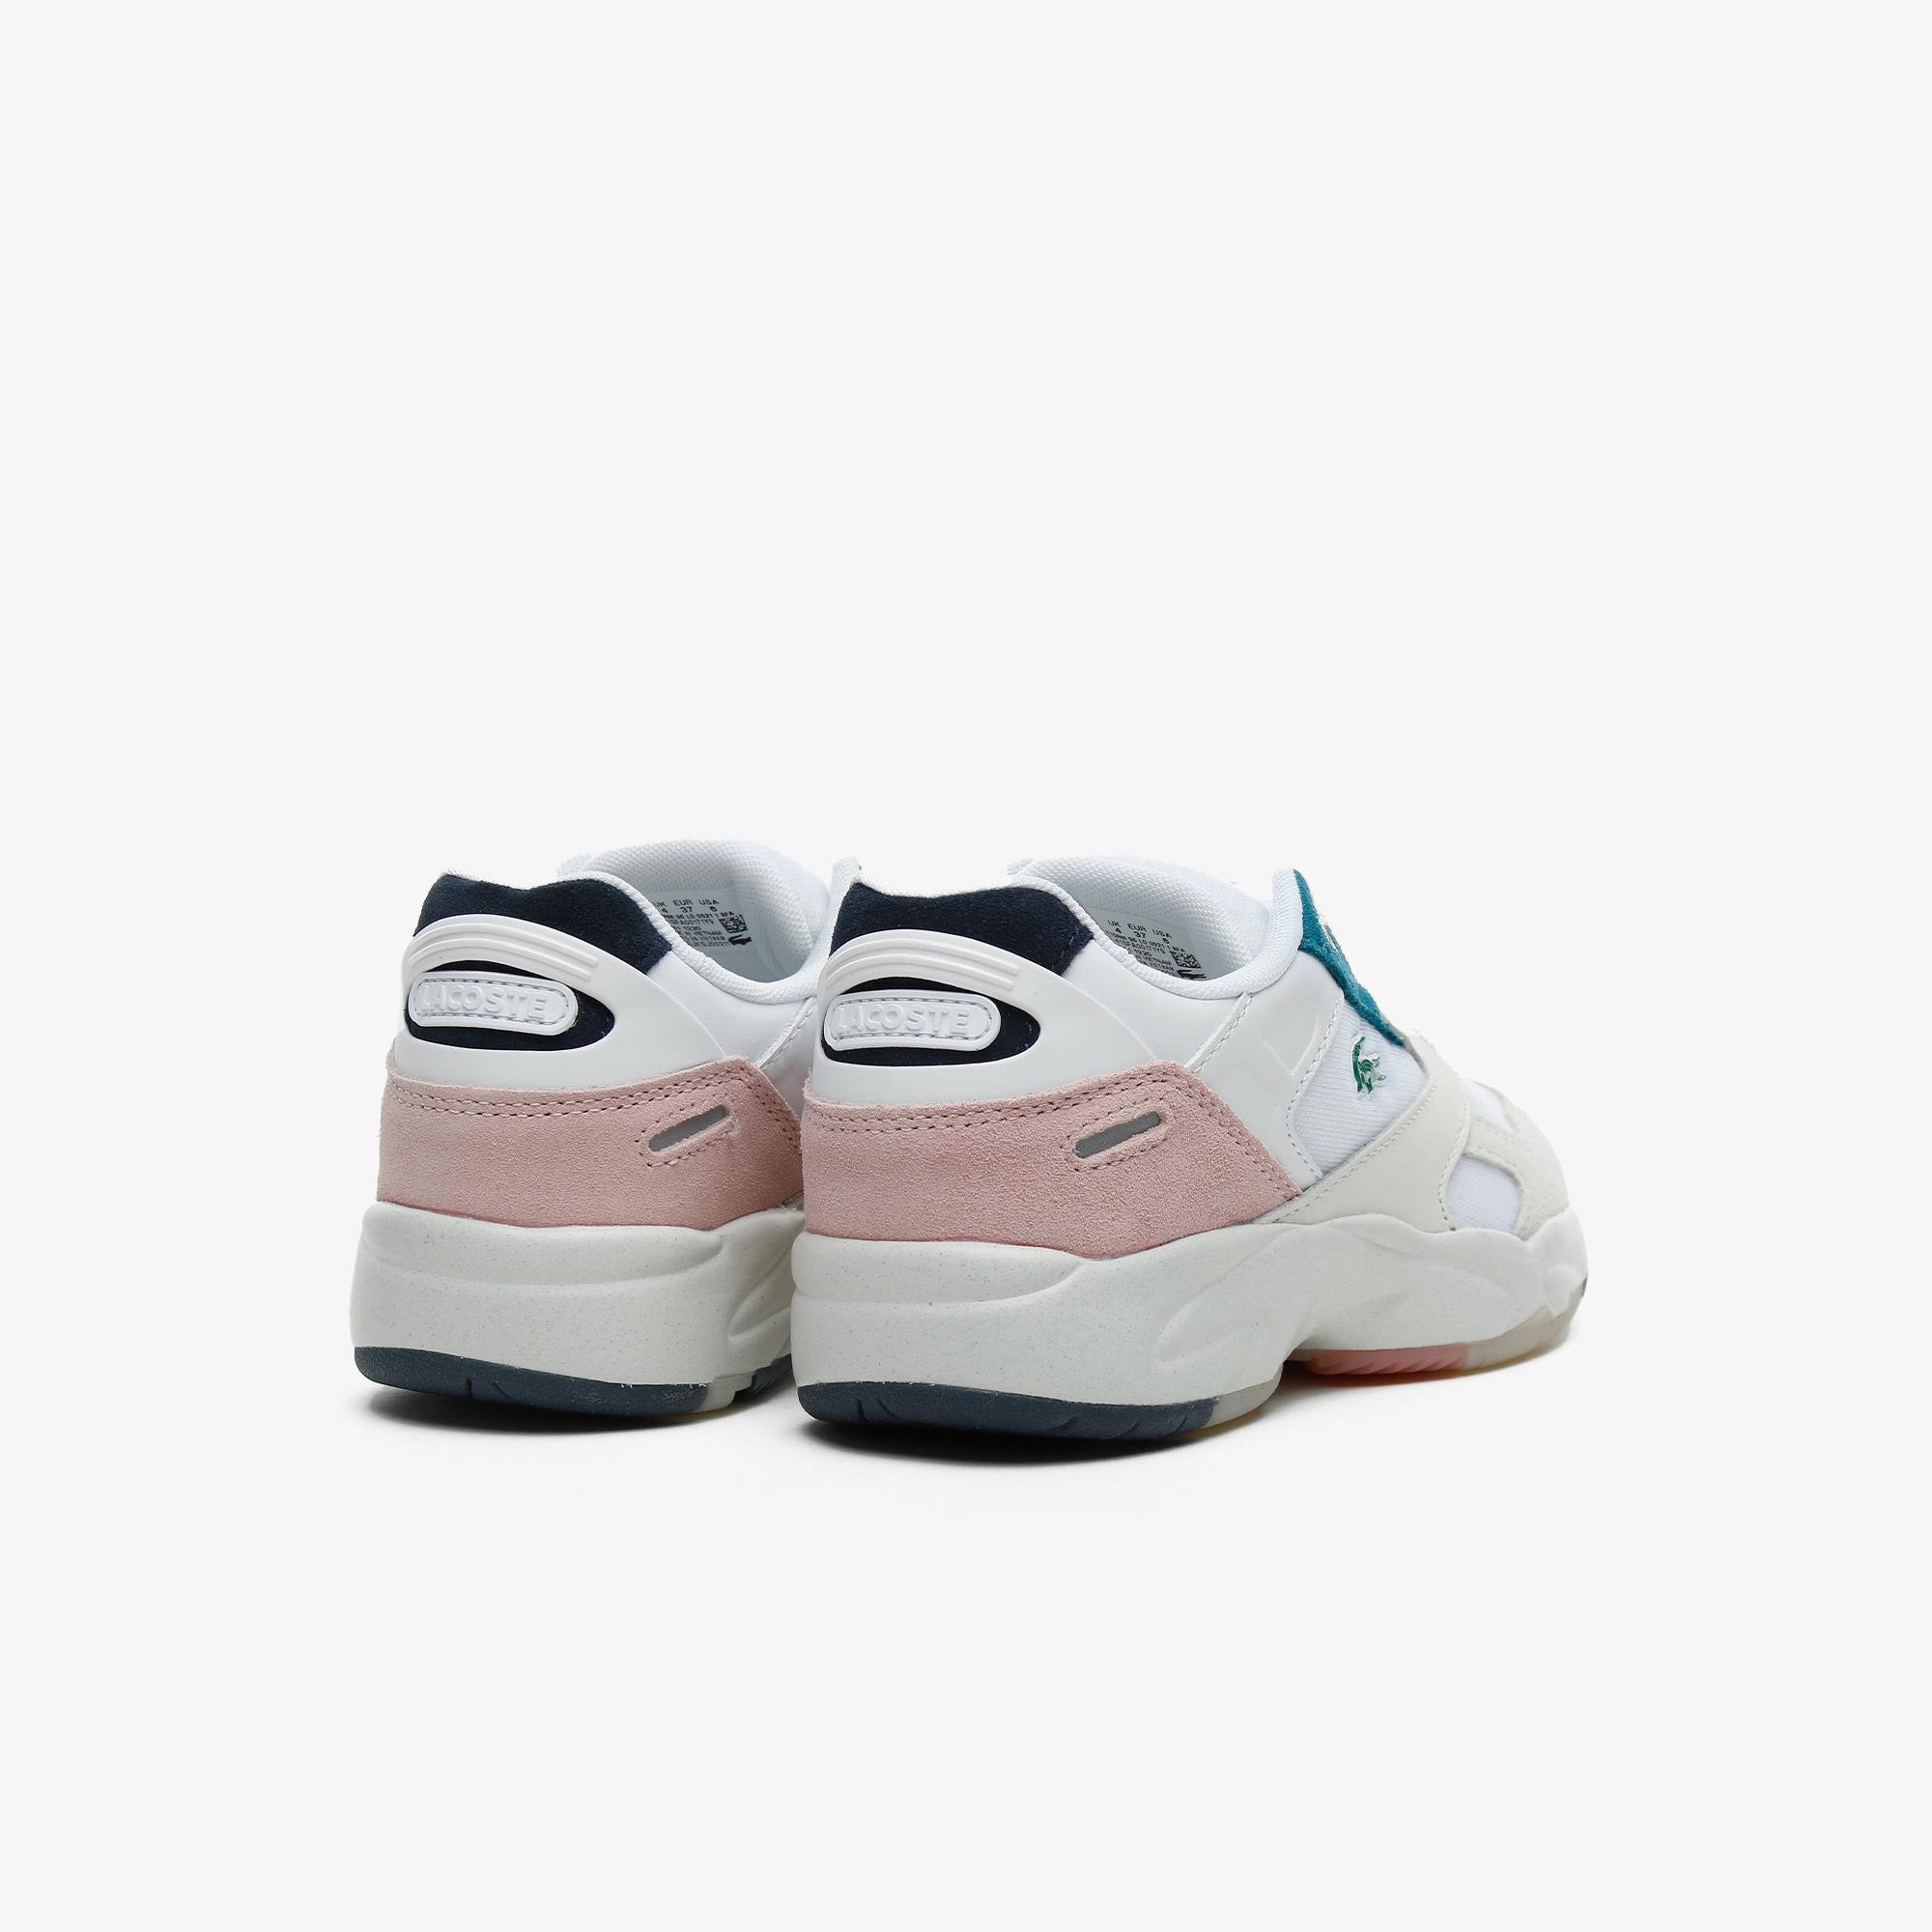 Lacoste Damskie buty Storm 96 Lo 0921 1 Sfa